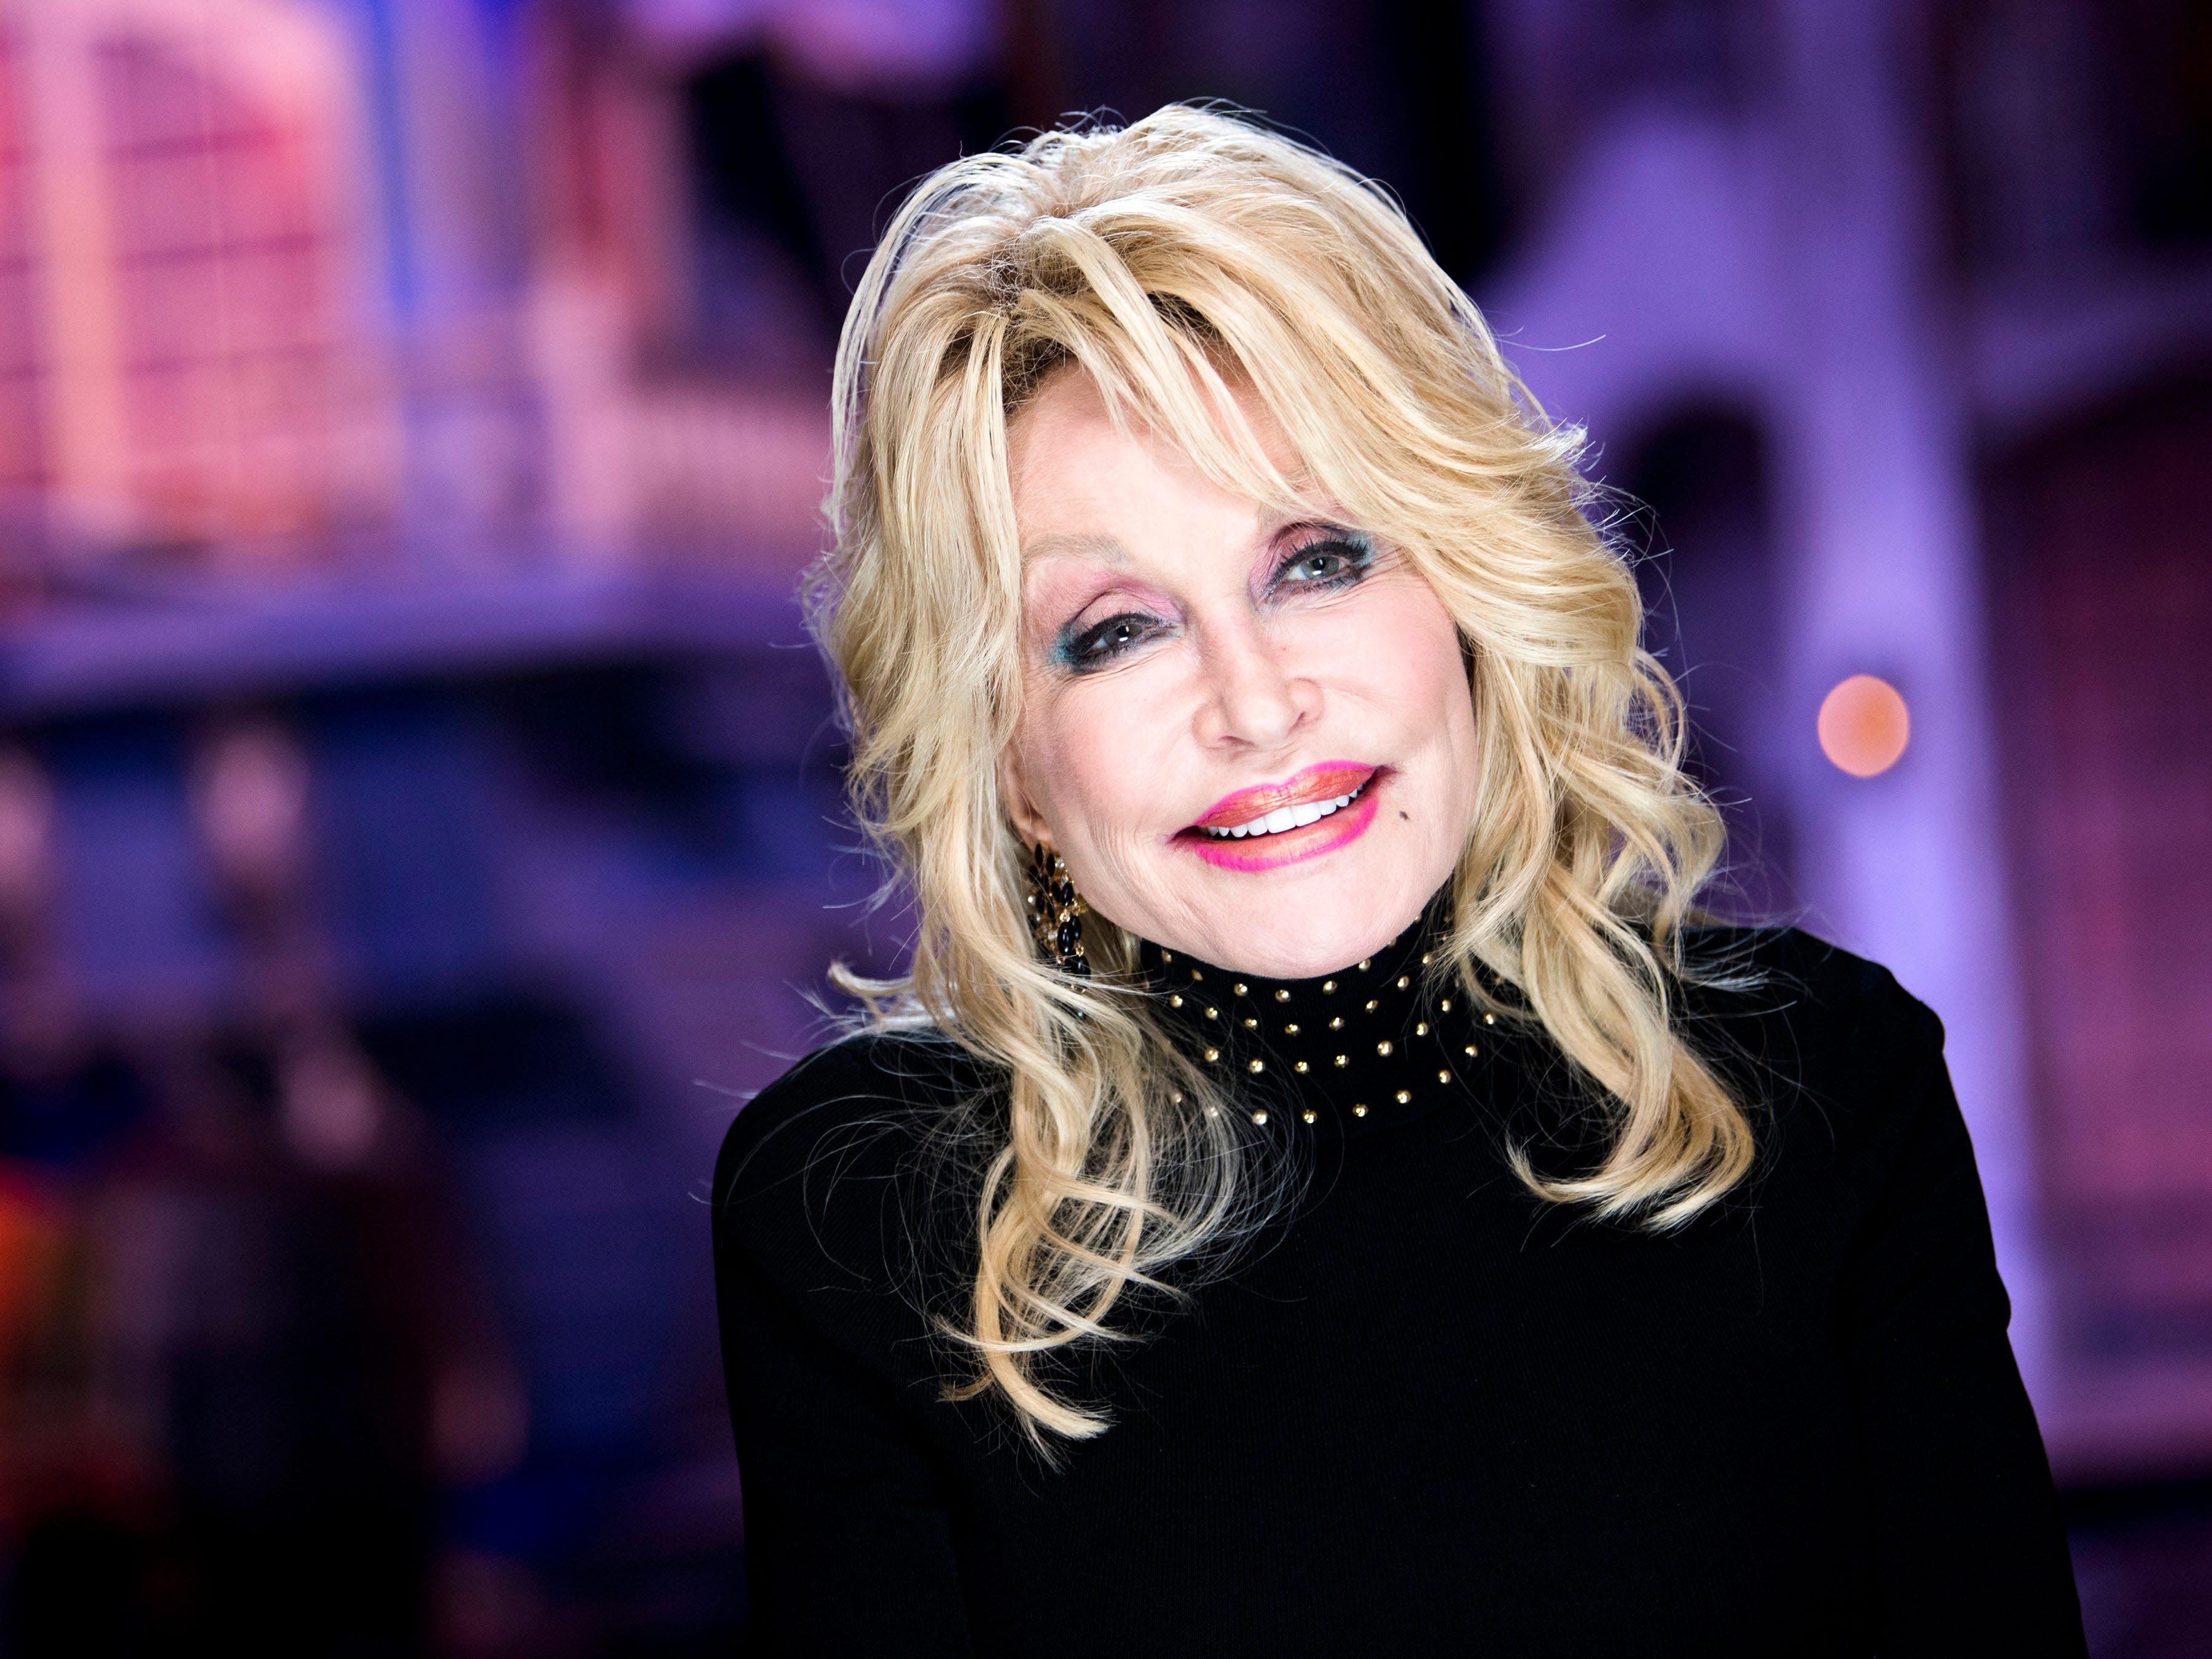 Dolly Parton Christmas.Dolly Parton Gets Her Own Hallmark Christmas Movie